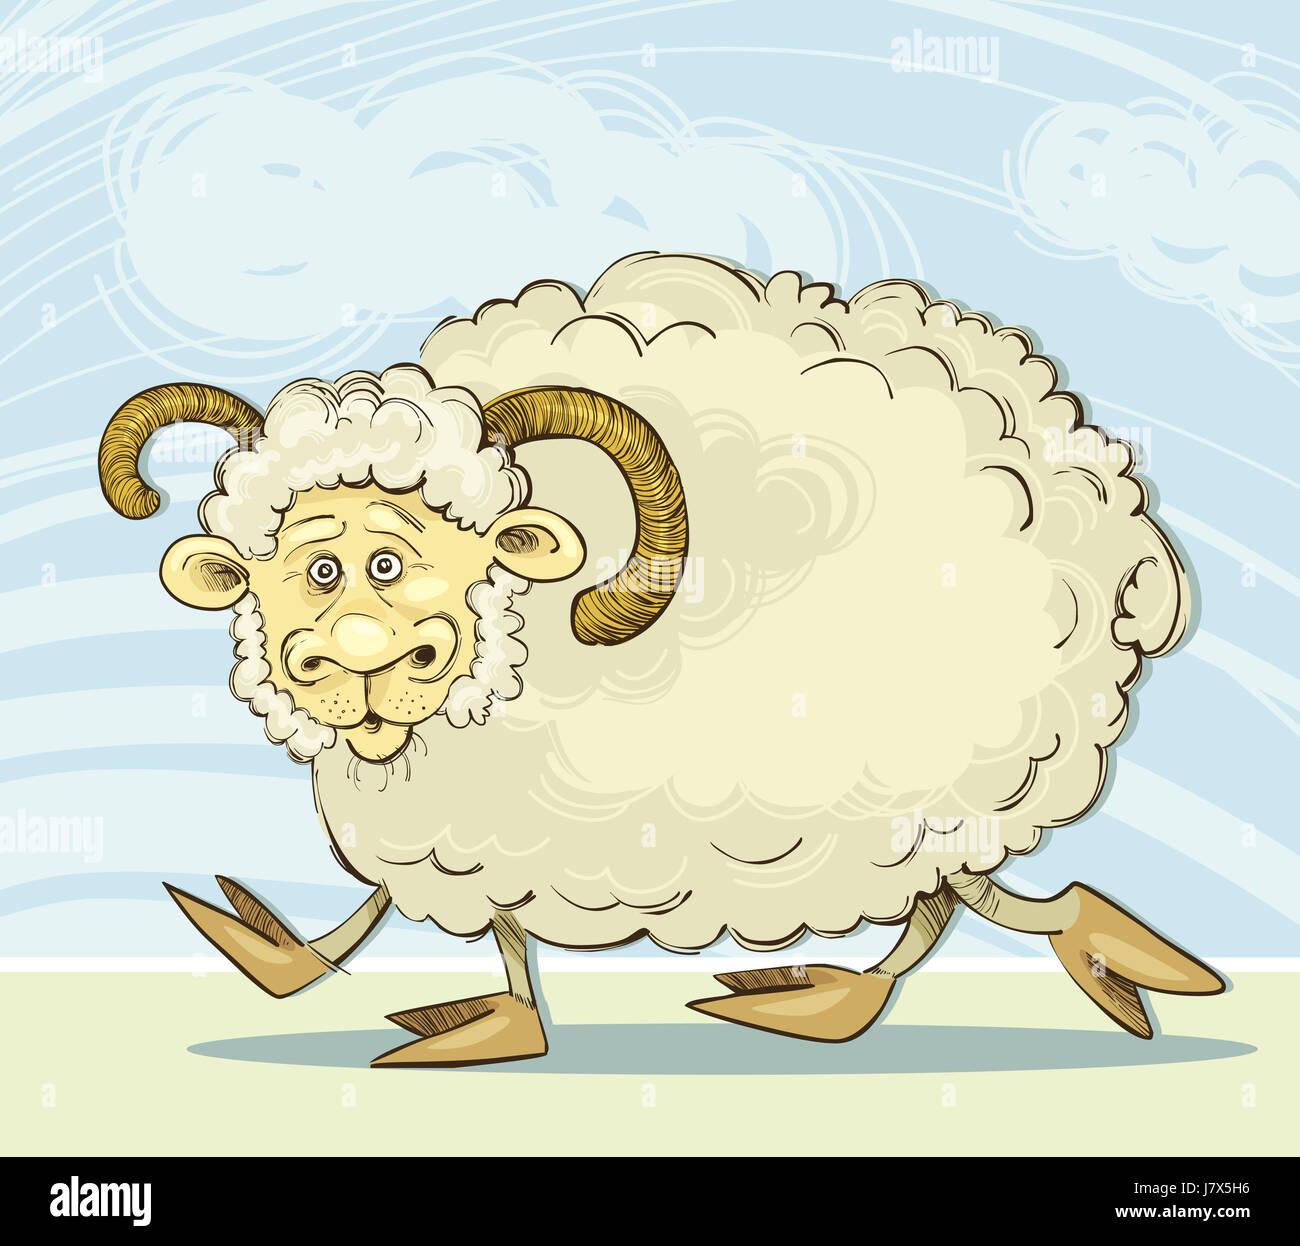 sheep illustration ram farm zodiac cartoon comics walk go going walking art Stock Photo